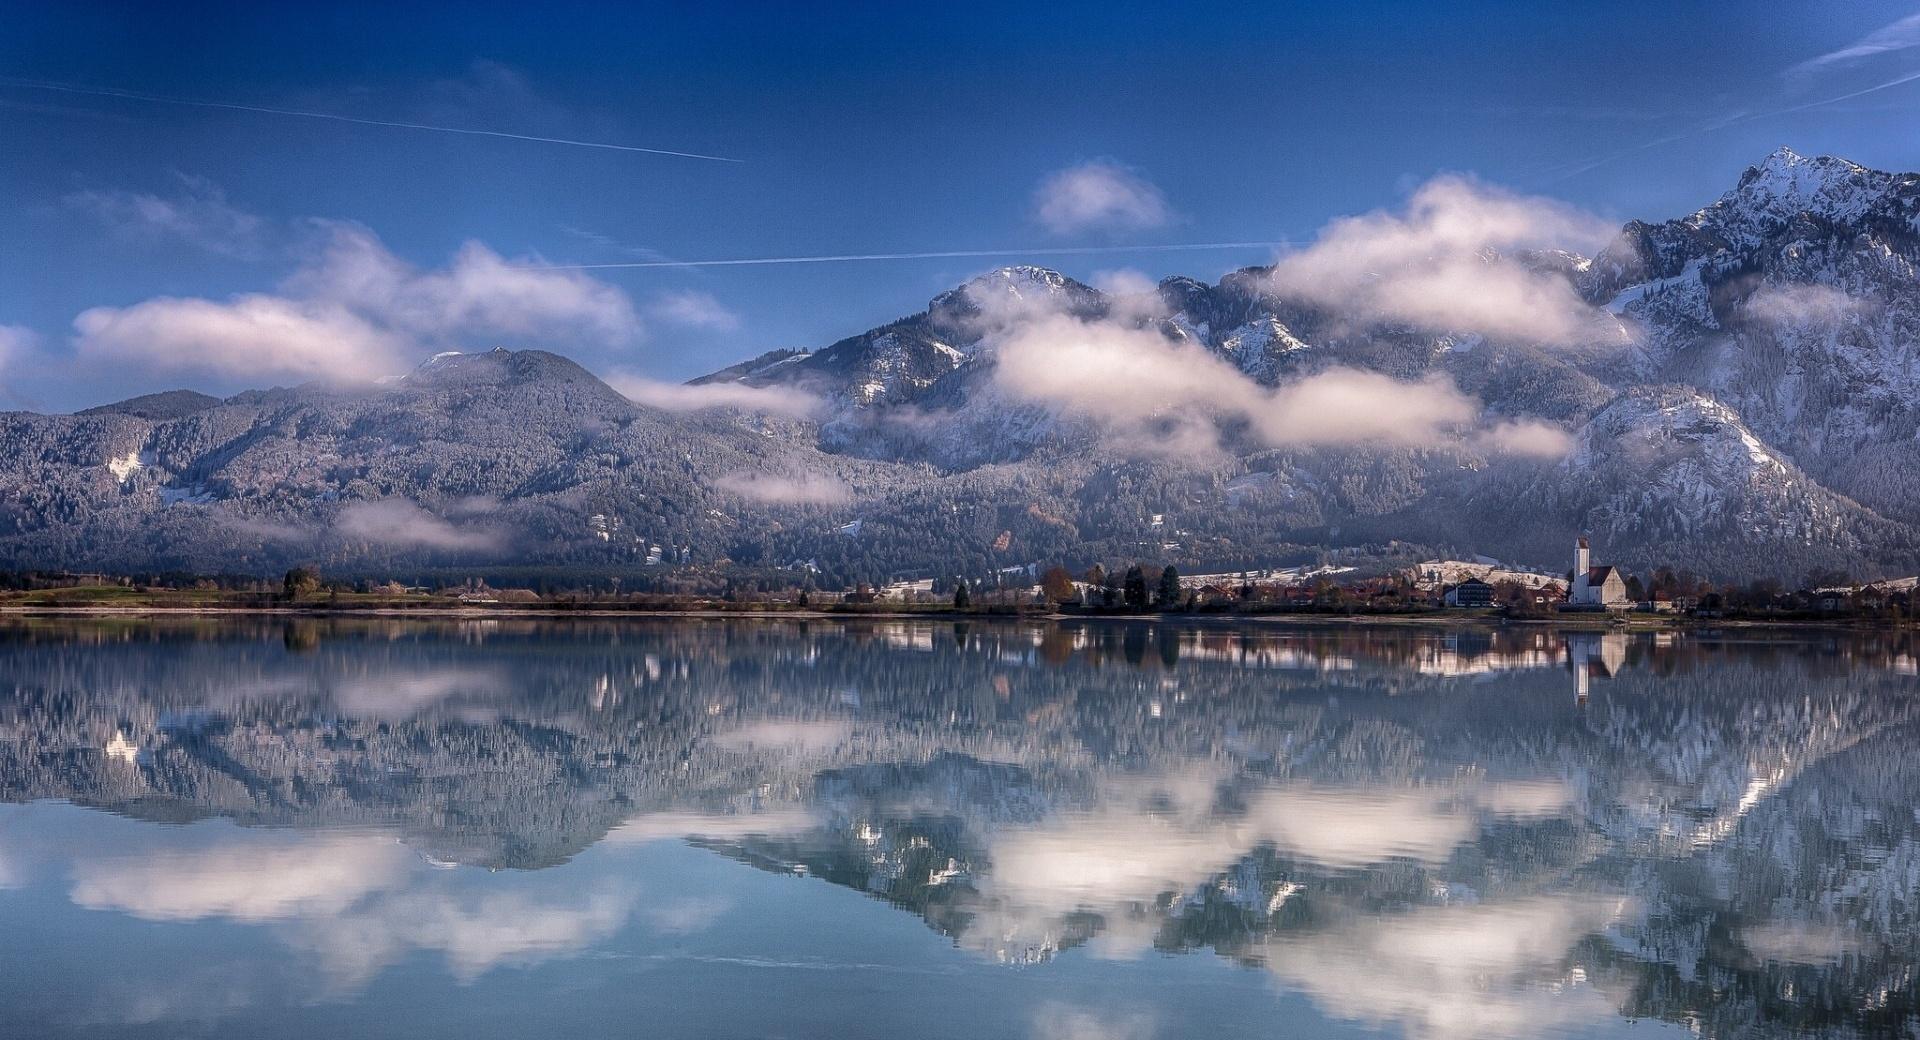 Forggensee Lake, Bavaria, Germany wallpapers HD quality